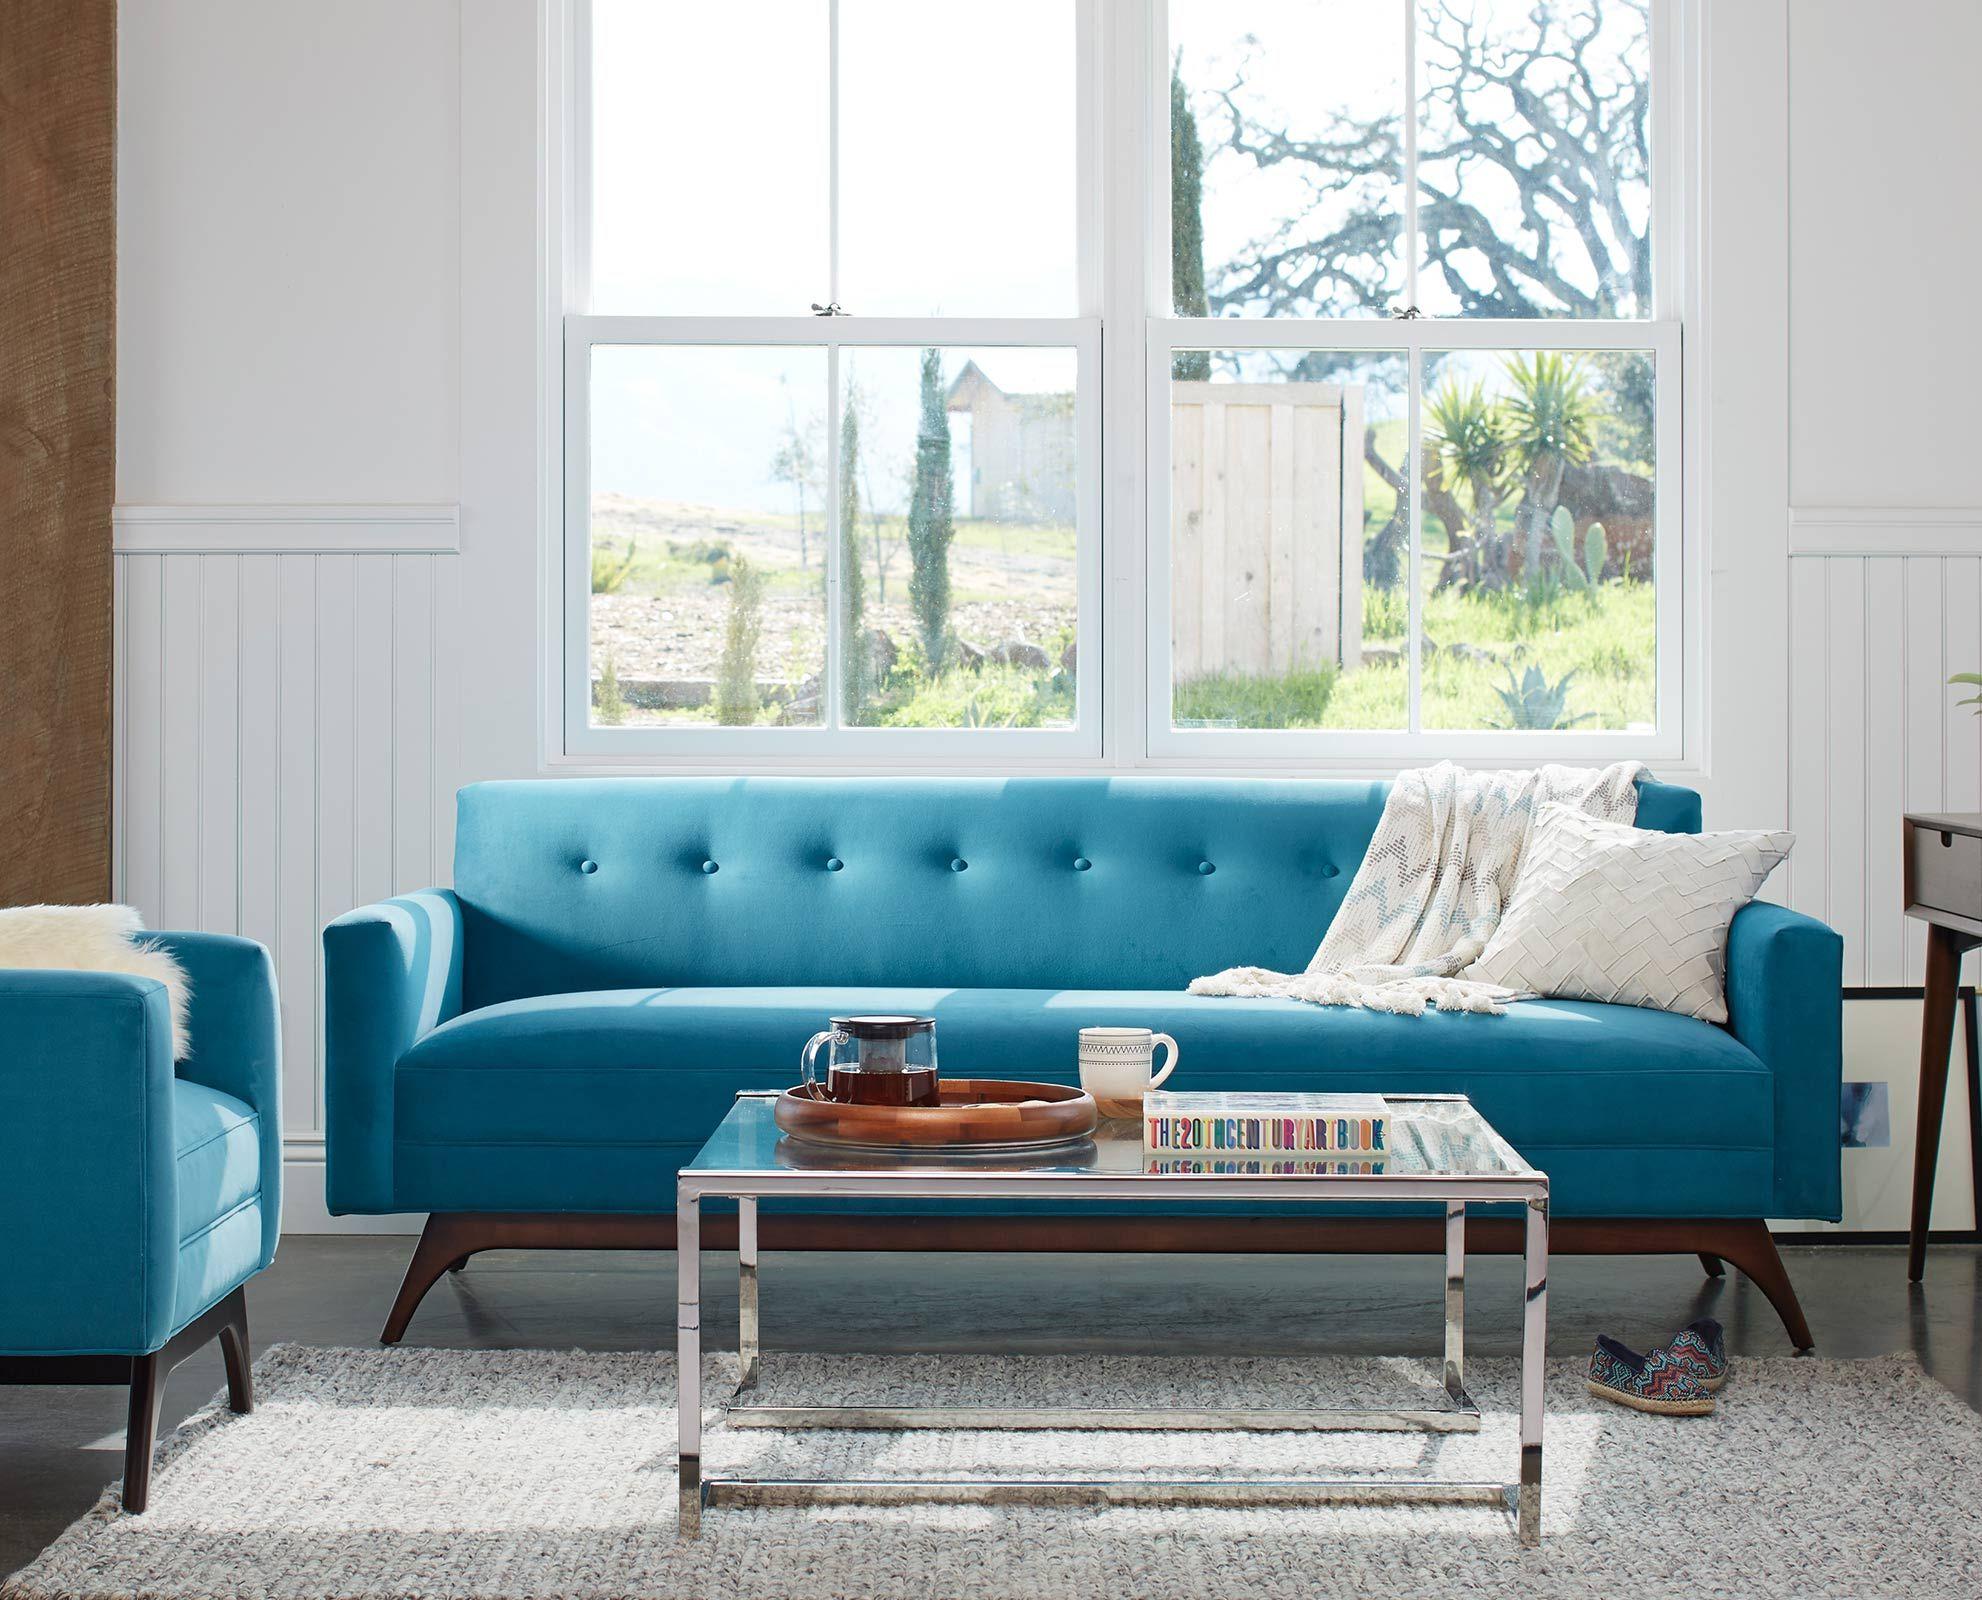 Dania The Hagen sofa offers refined mid century modern style